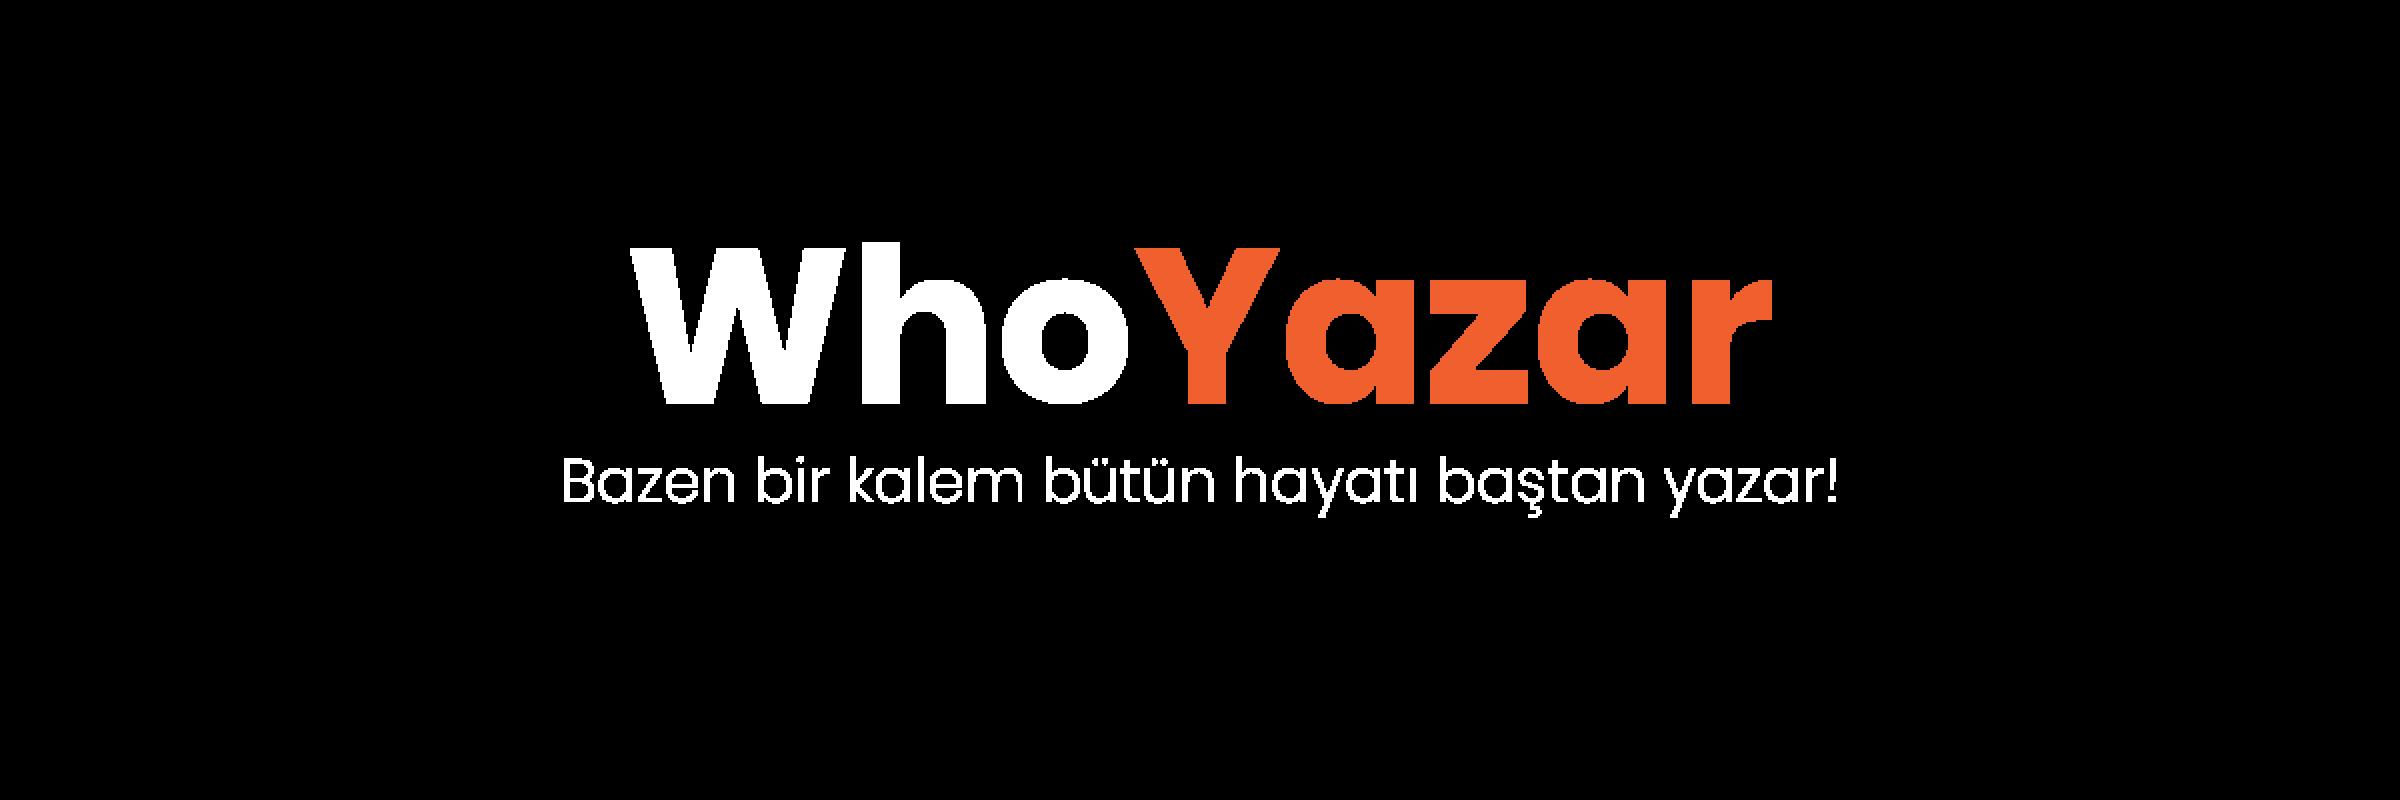 WhoYazar